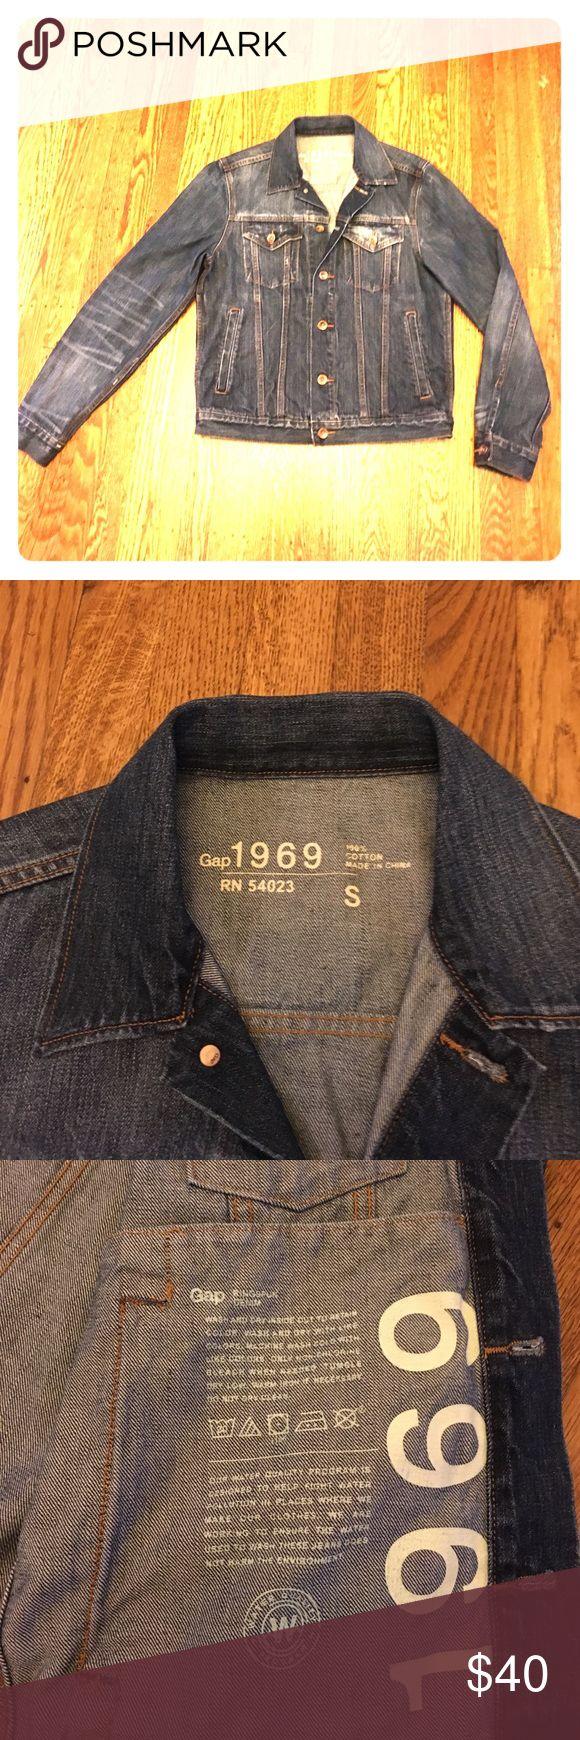 Gap 1969 men's jean jacket size small Gap 1969 men's jean jacket size small. In brand new condition. GAP Jackets & Coats Performance Jackets